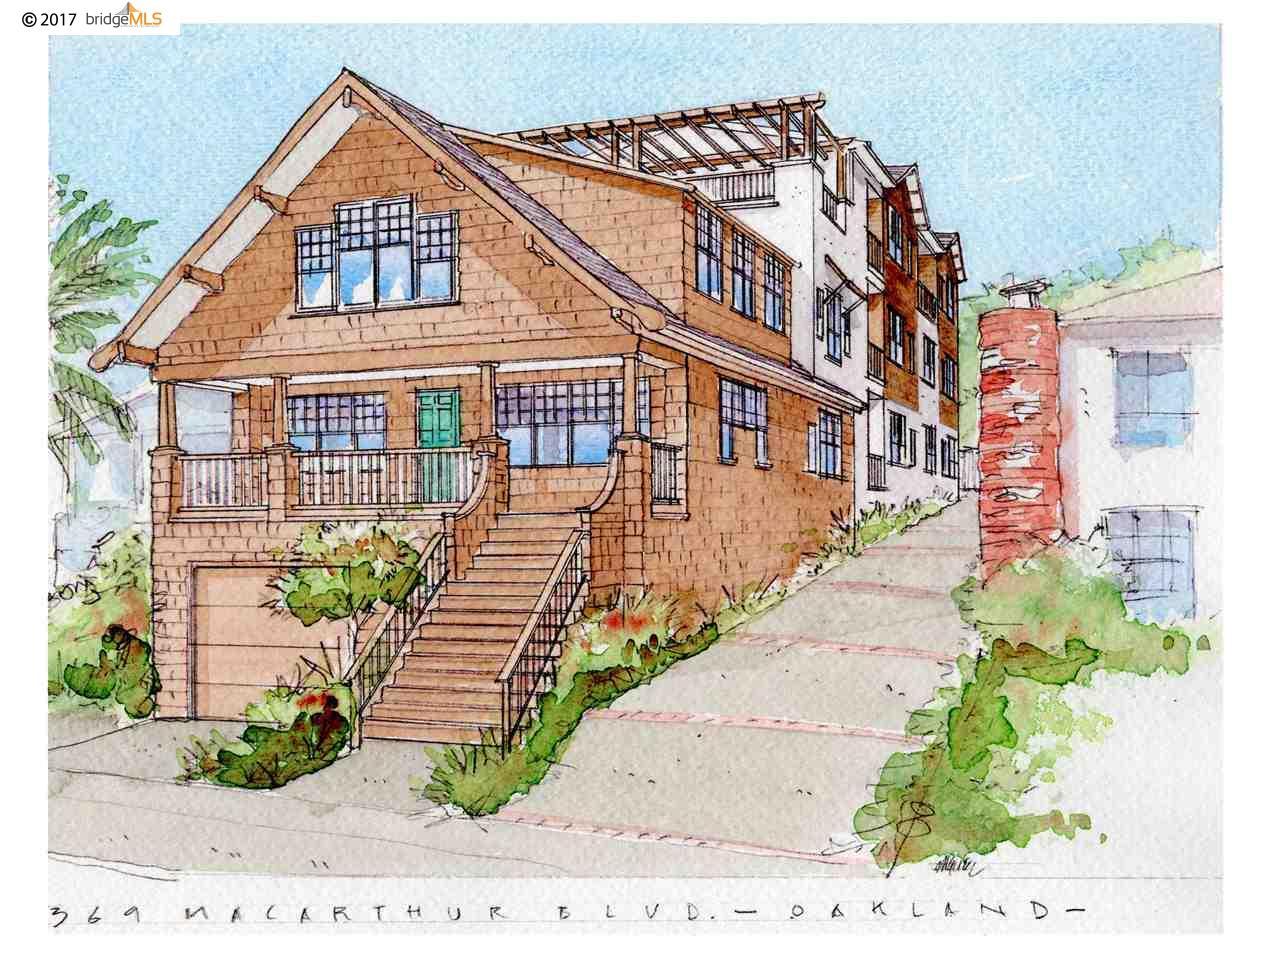 369 Macarthur Blvd, OAKLAND, CA 94610